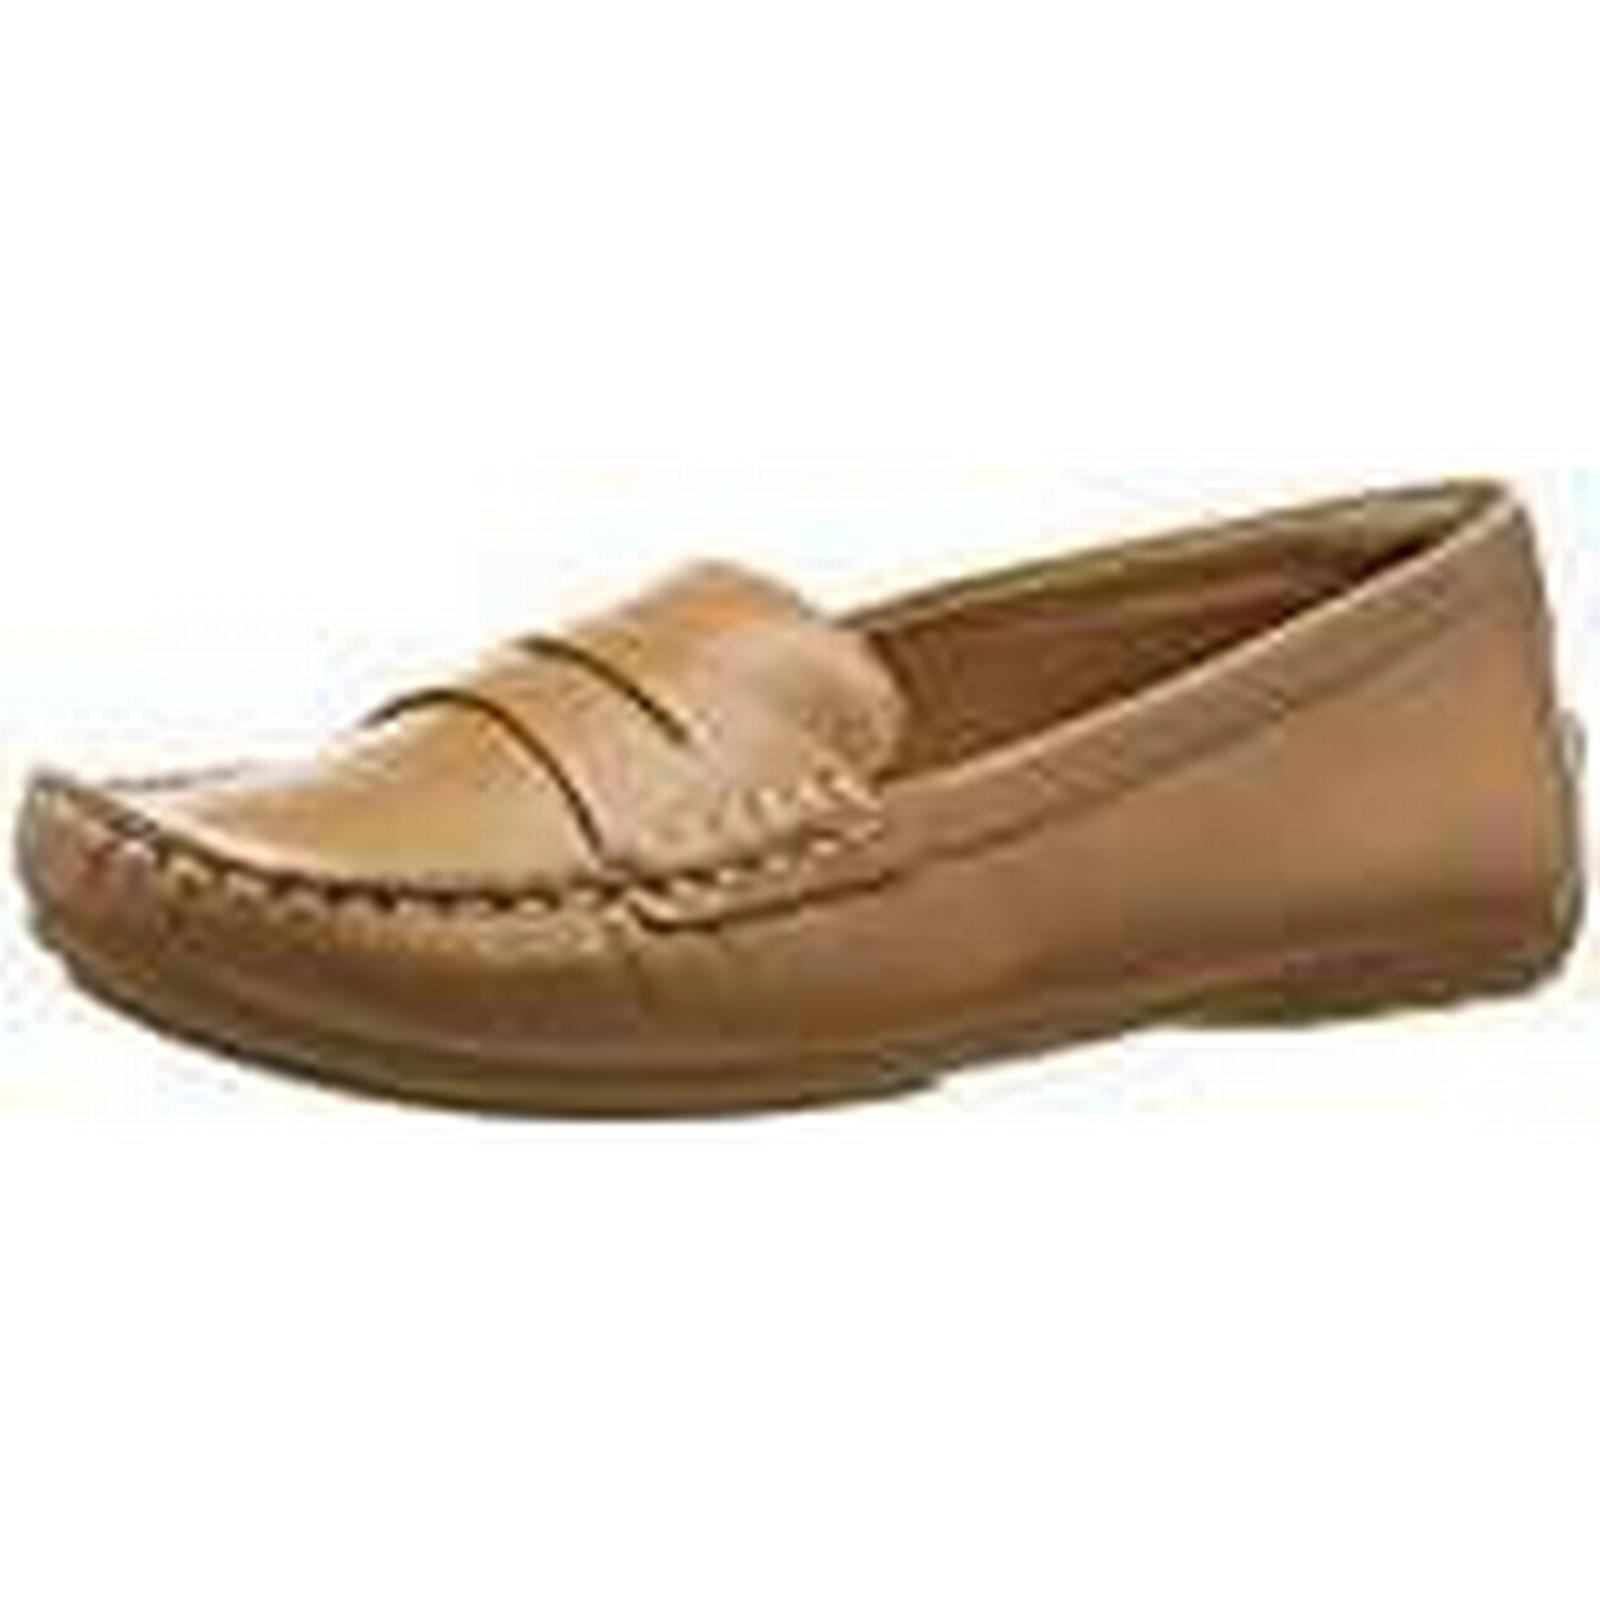 Clarks Doraville Nest, Women's 6 Mocassins, Brown (tan Leather), 6 Women's UK (39.5 EU) 3c0472